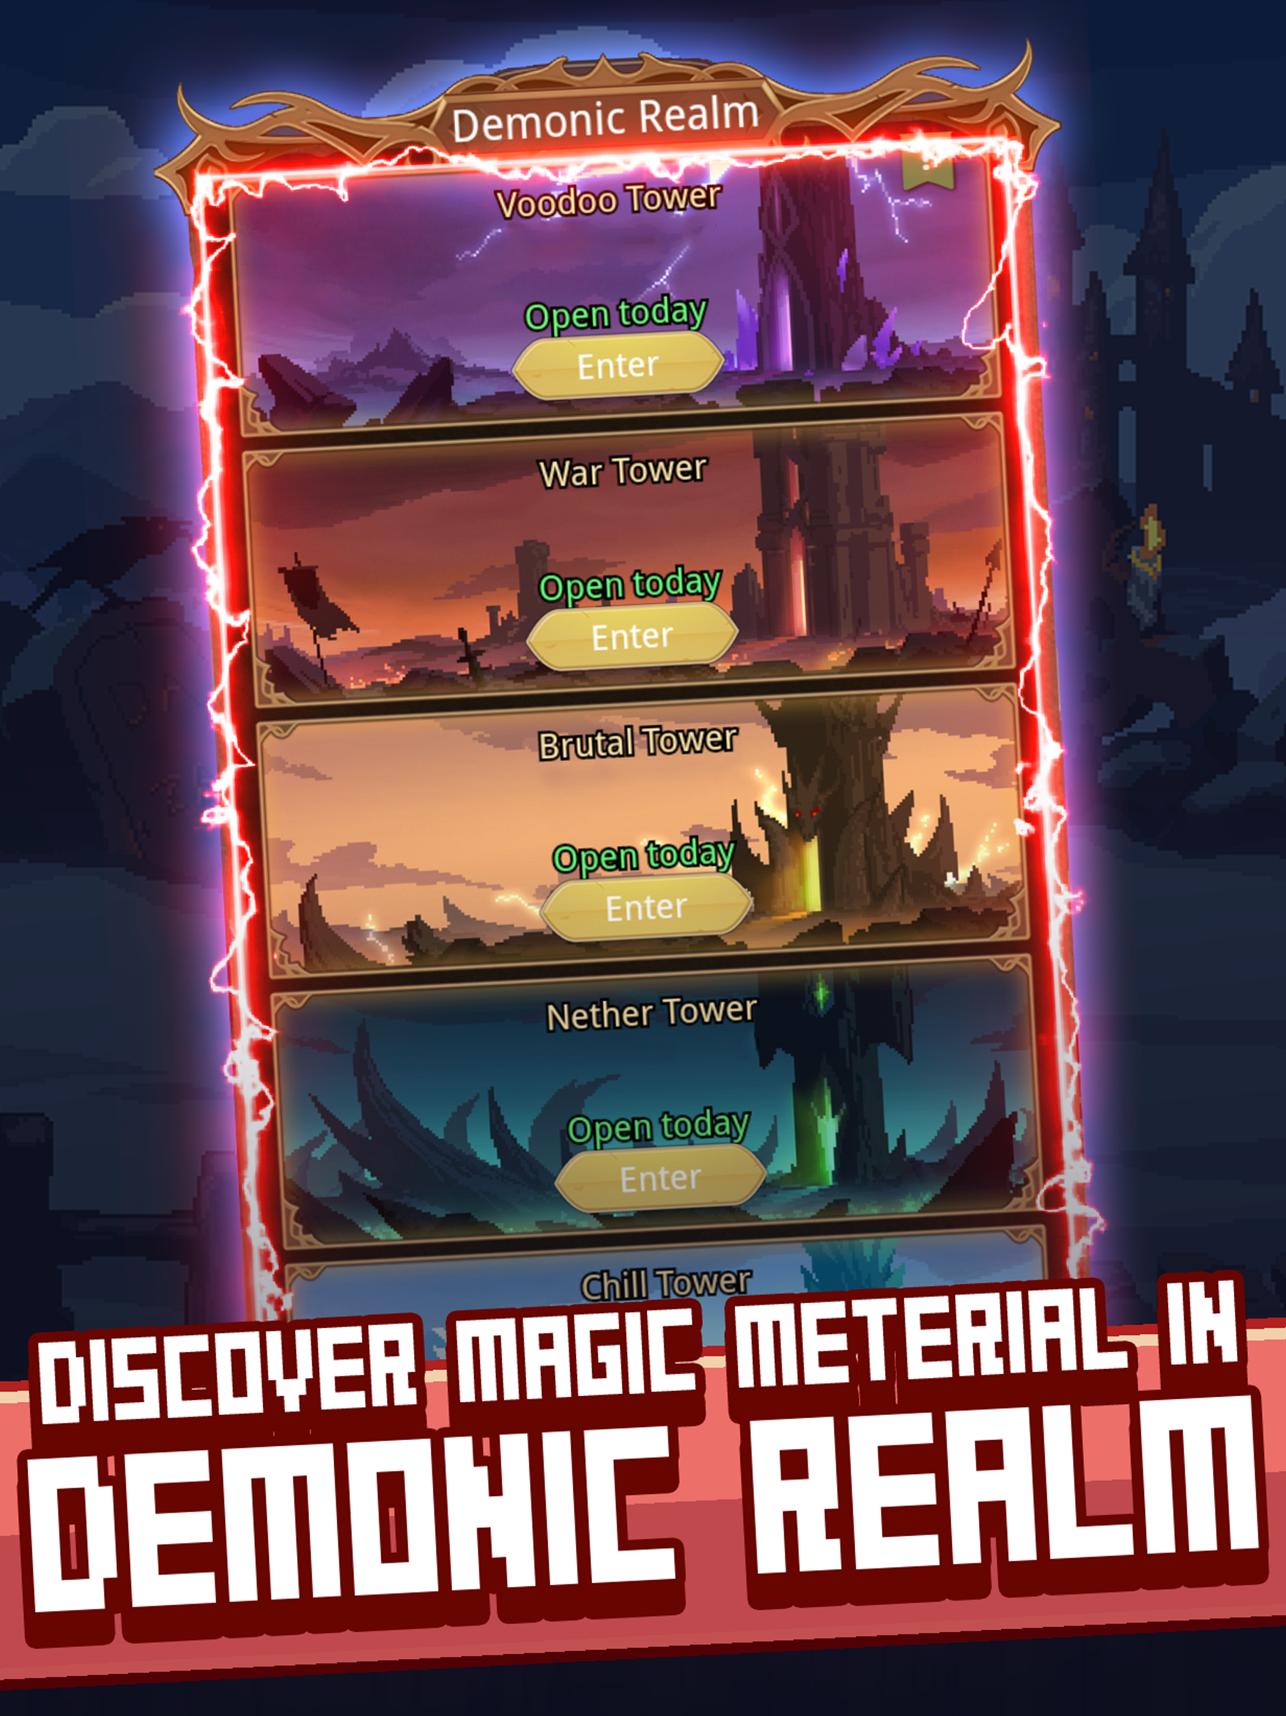 Little Hero - New Mobile Idle RPG Global Release Soon Image